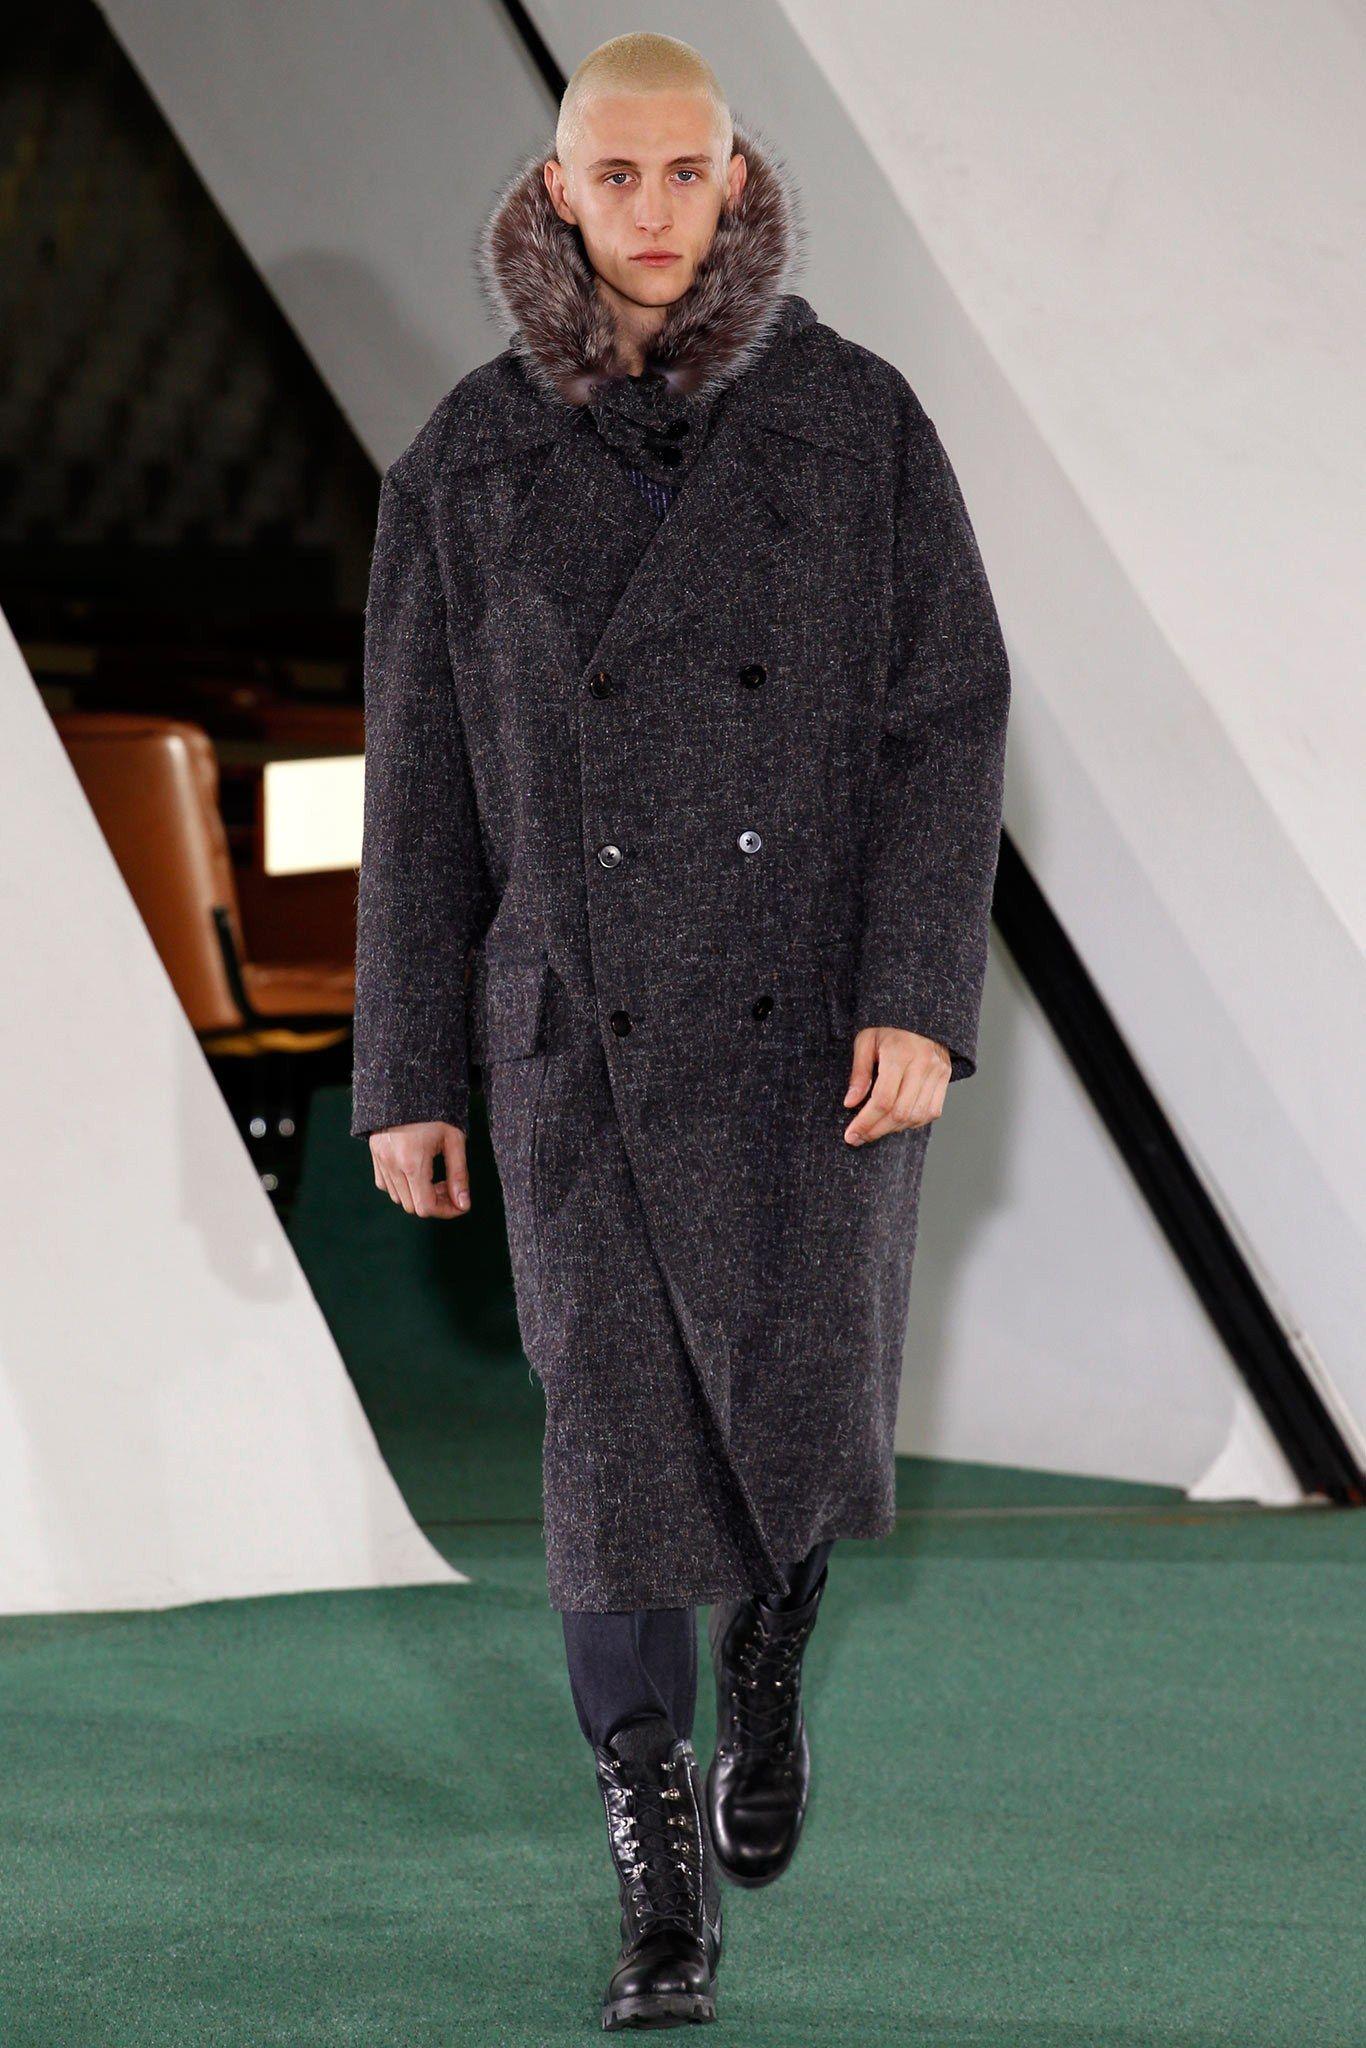 Maison Margiela Fall 2014 Menswear Fashion Show